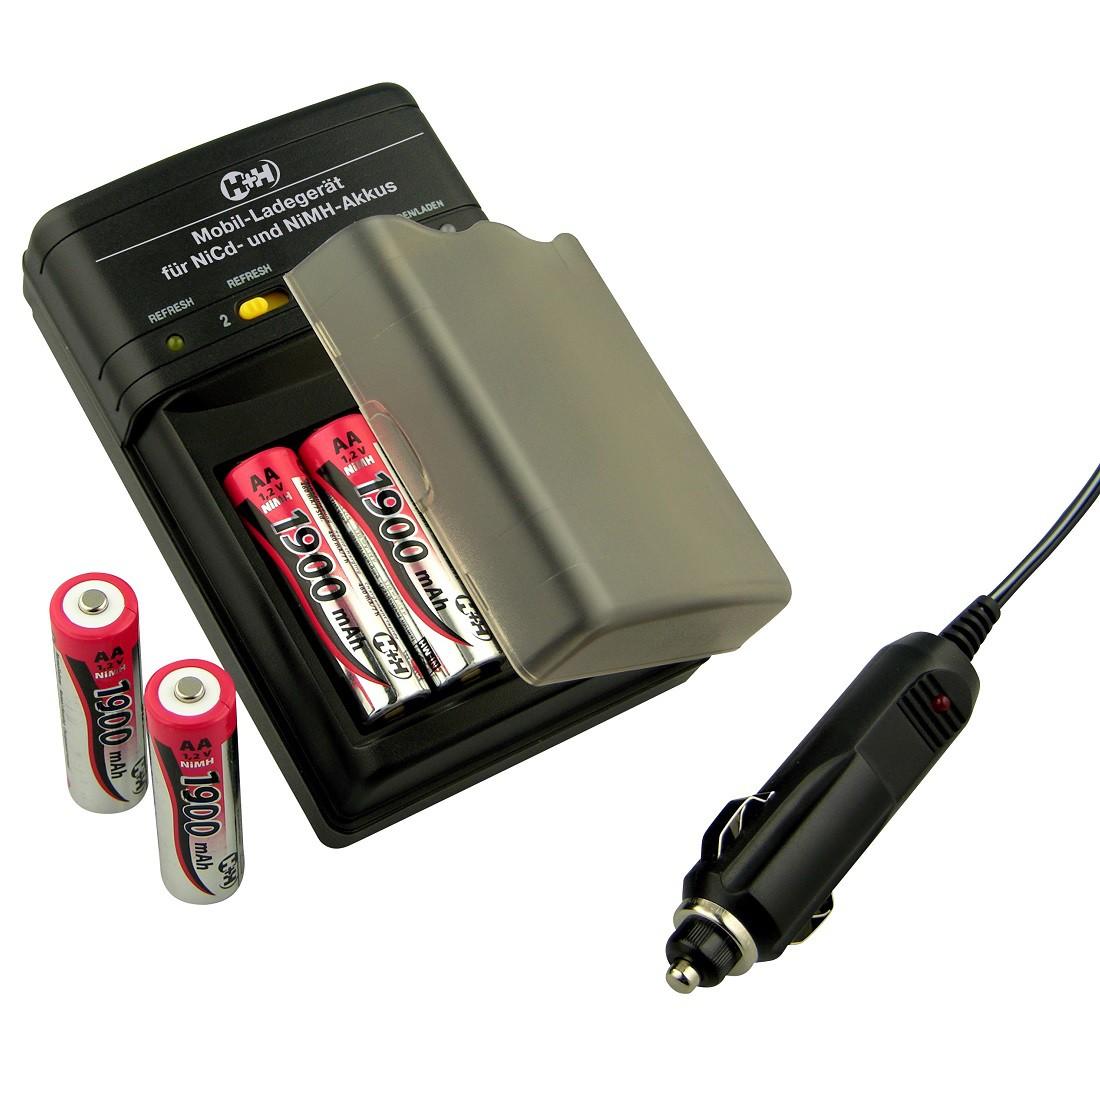 H+H BL 506 Mobil - Ladegerät mit Autoadapter B-Ware